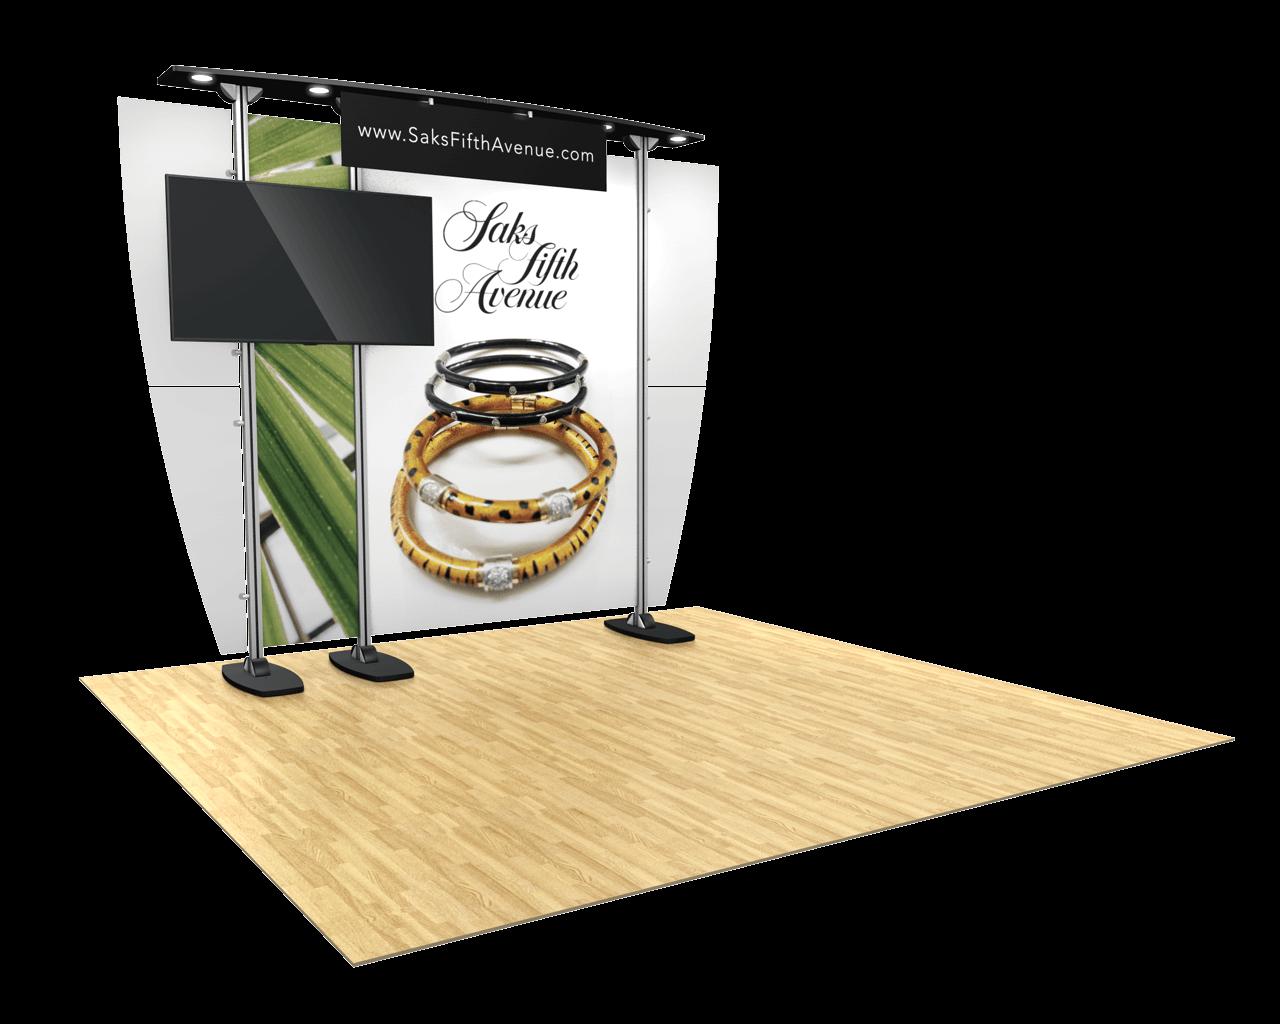 Exhibitline 10ft Trade Show Display - ex1.LP.0 Model